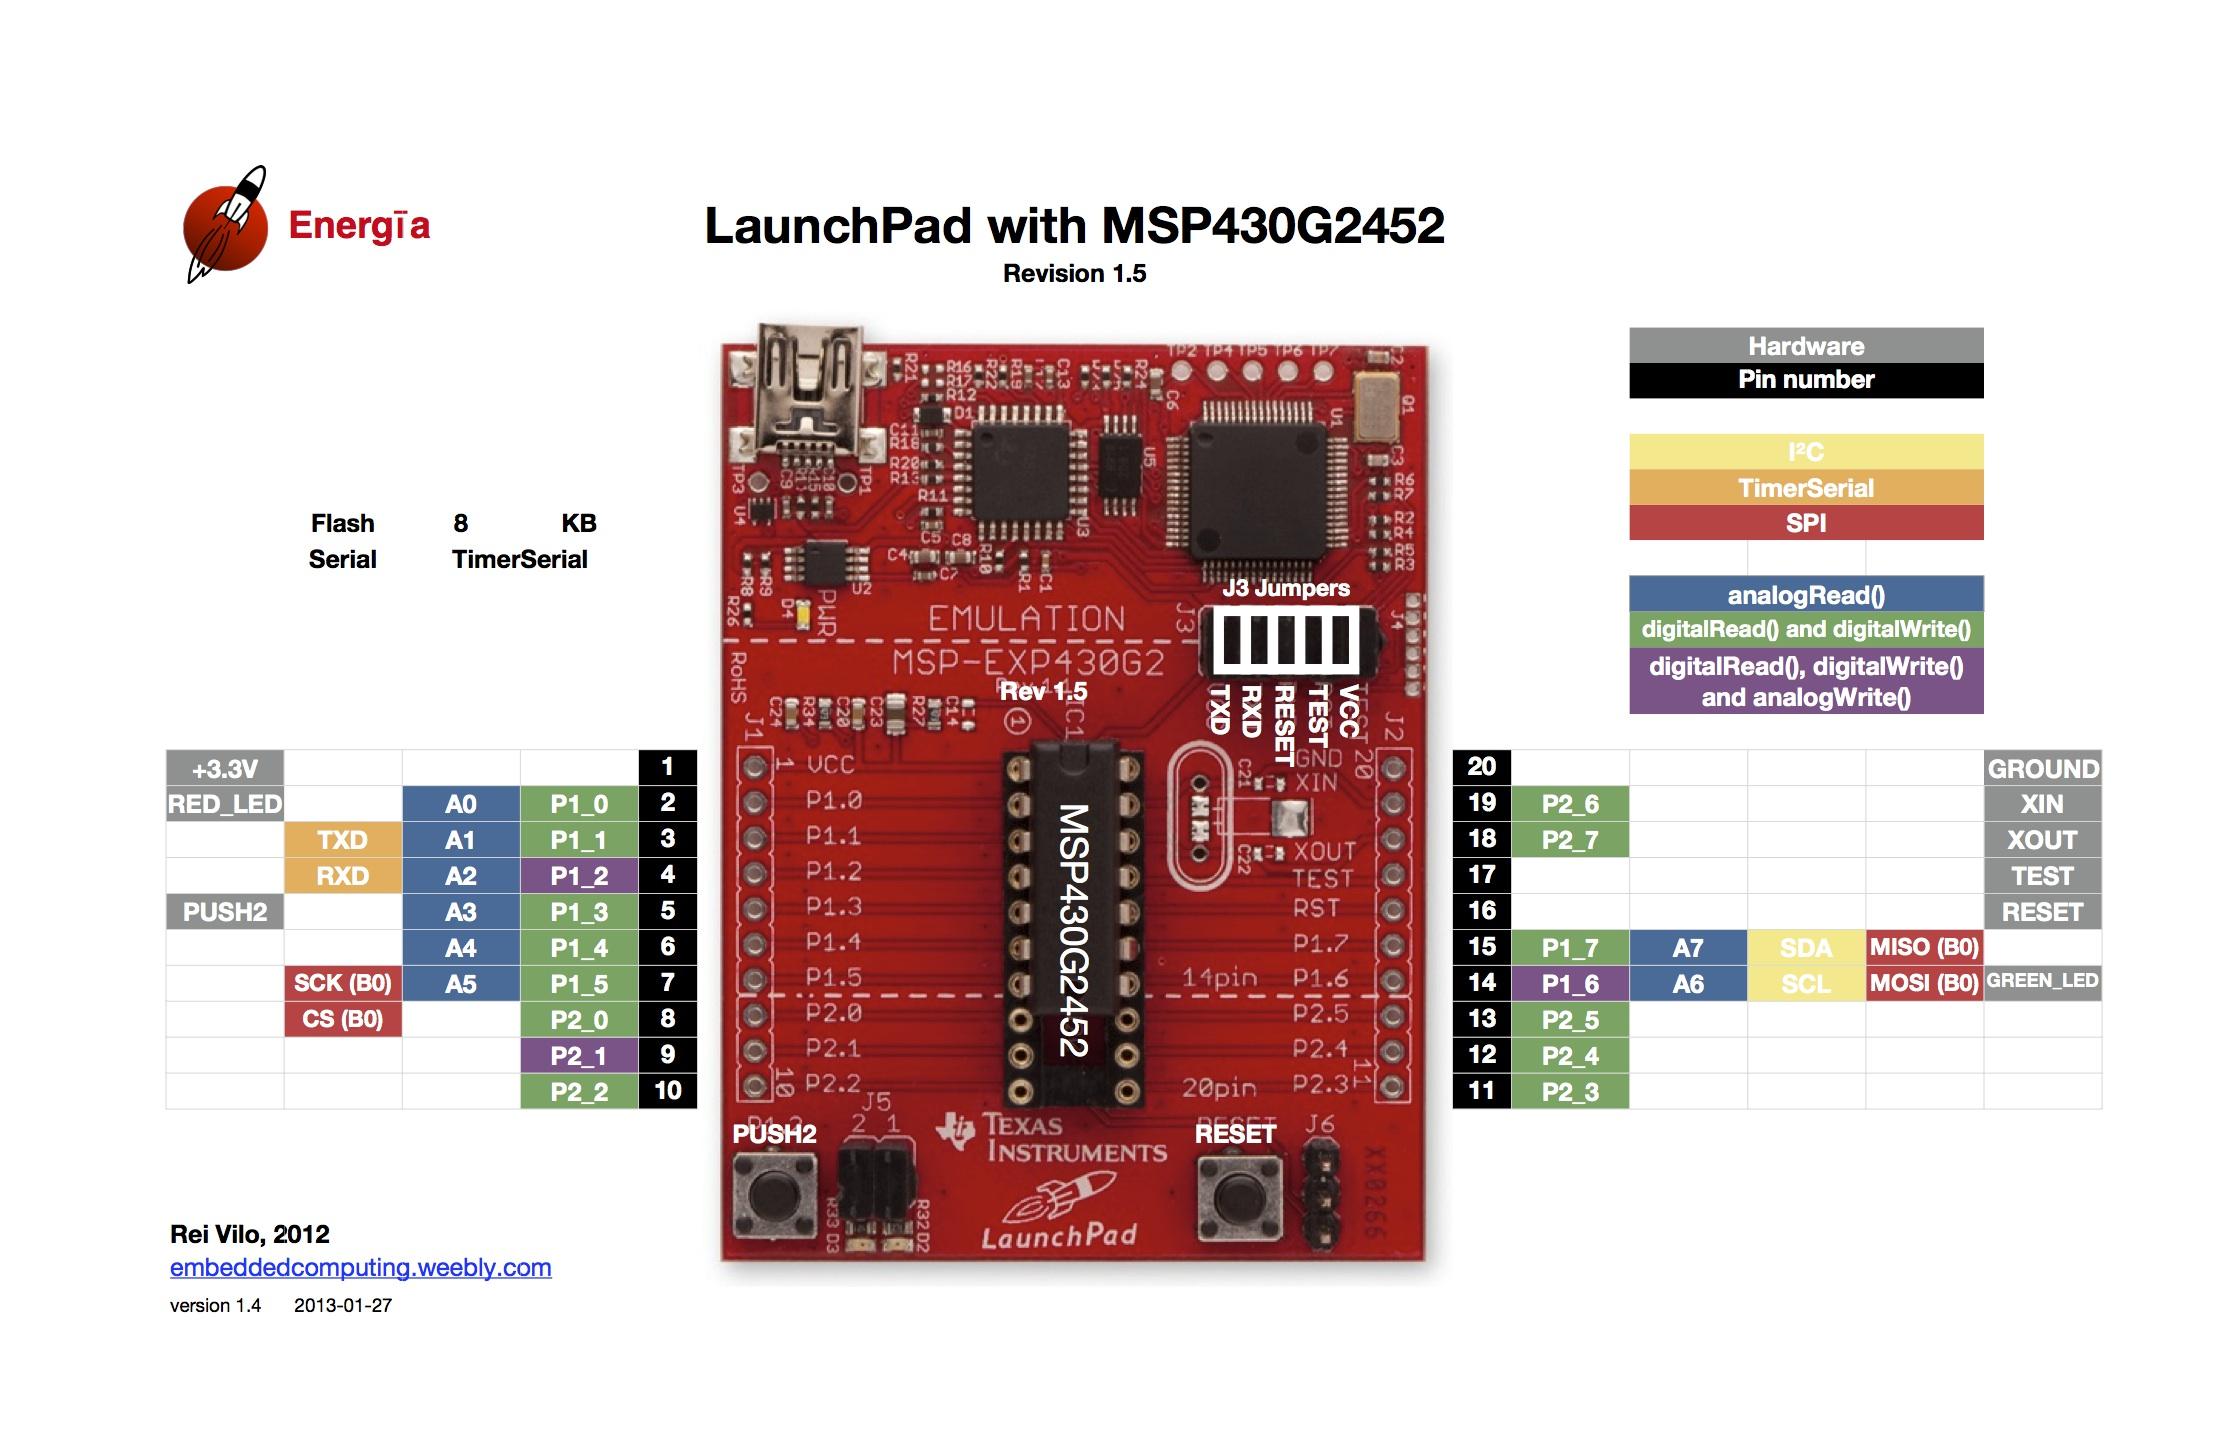 download security protocols xx 20th international workshop cambridge uk april 12 13 2012 revised selected